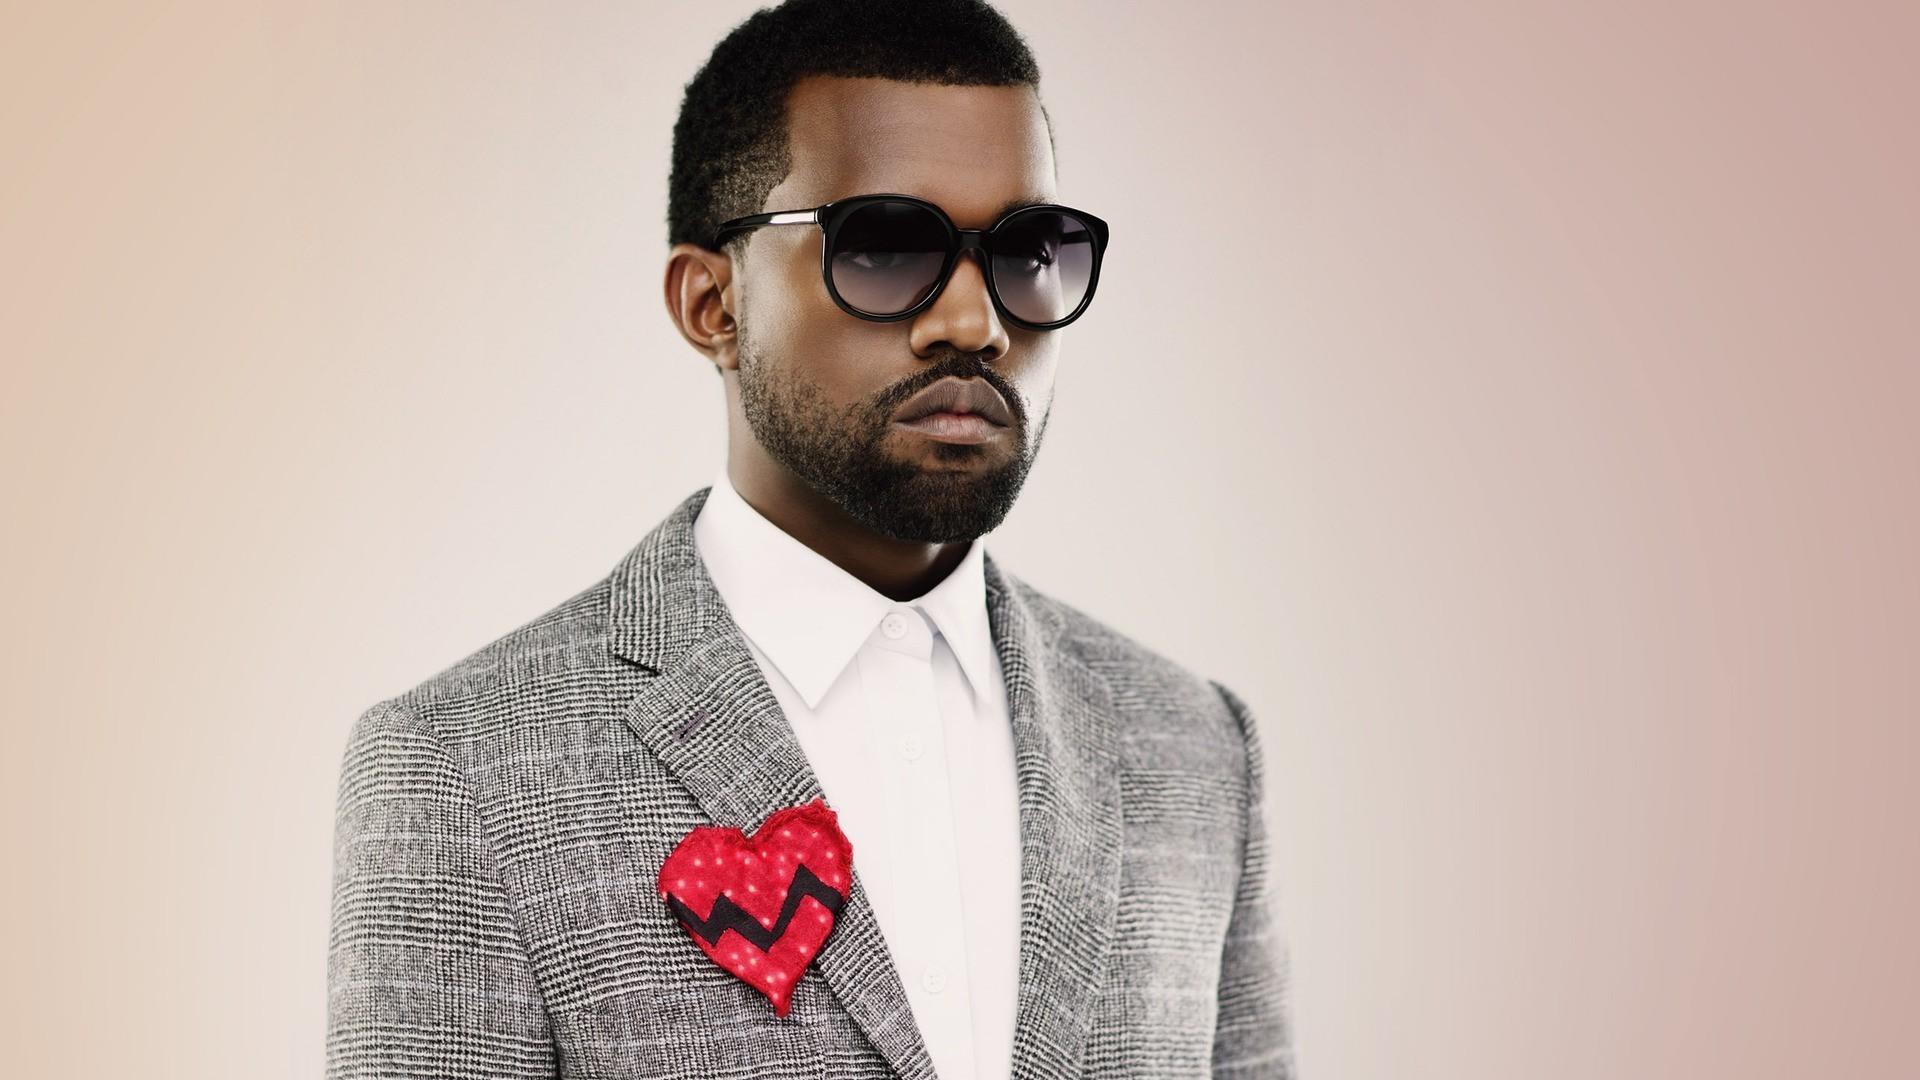 13 HD Kanye West Desktop Wallpapers For Free Download